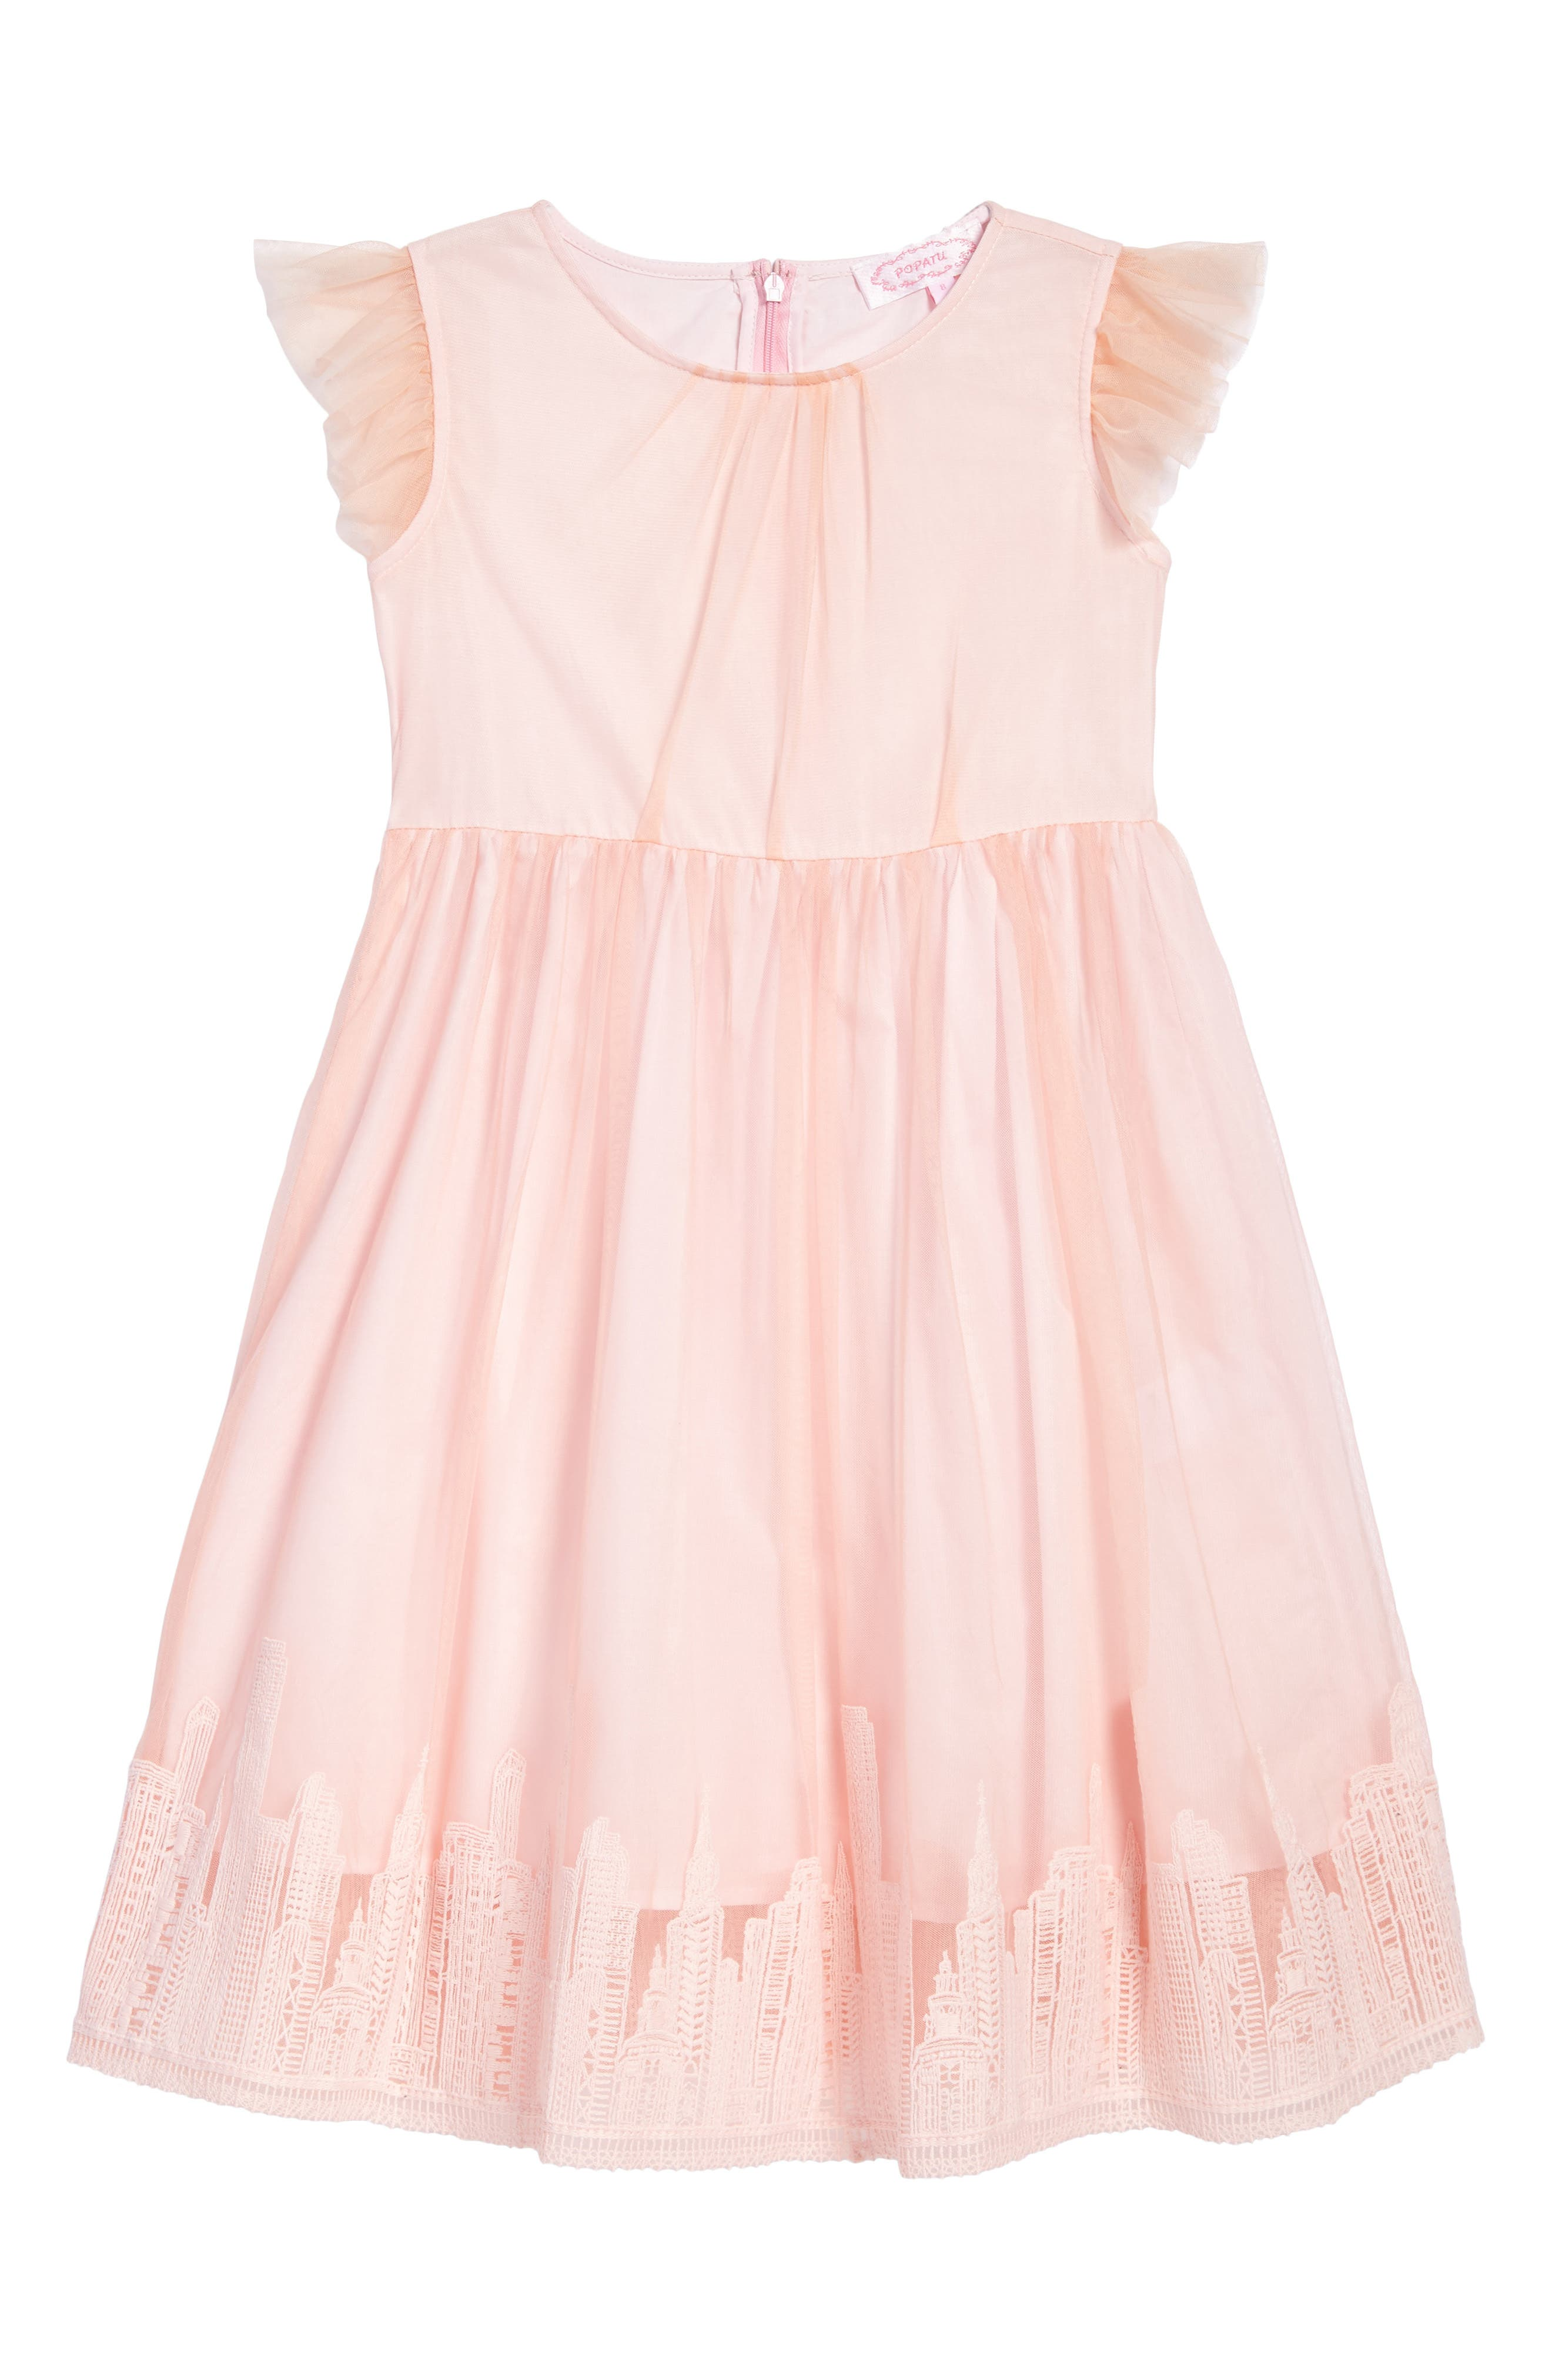 Main Image - Popatu Embroidered Tulle Dress (Toddler Girls, Little Girls & Big Girls)